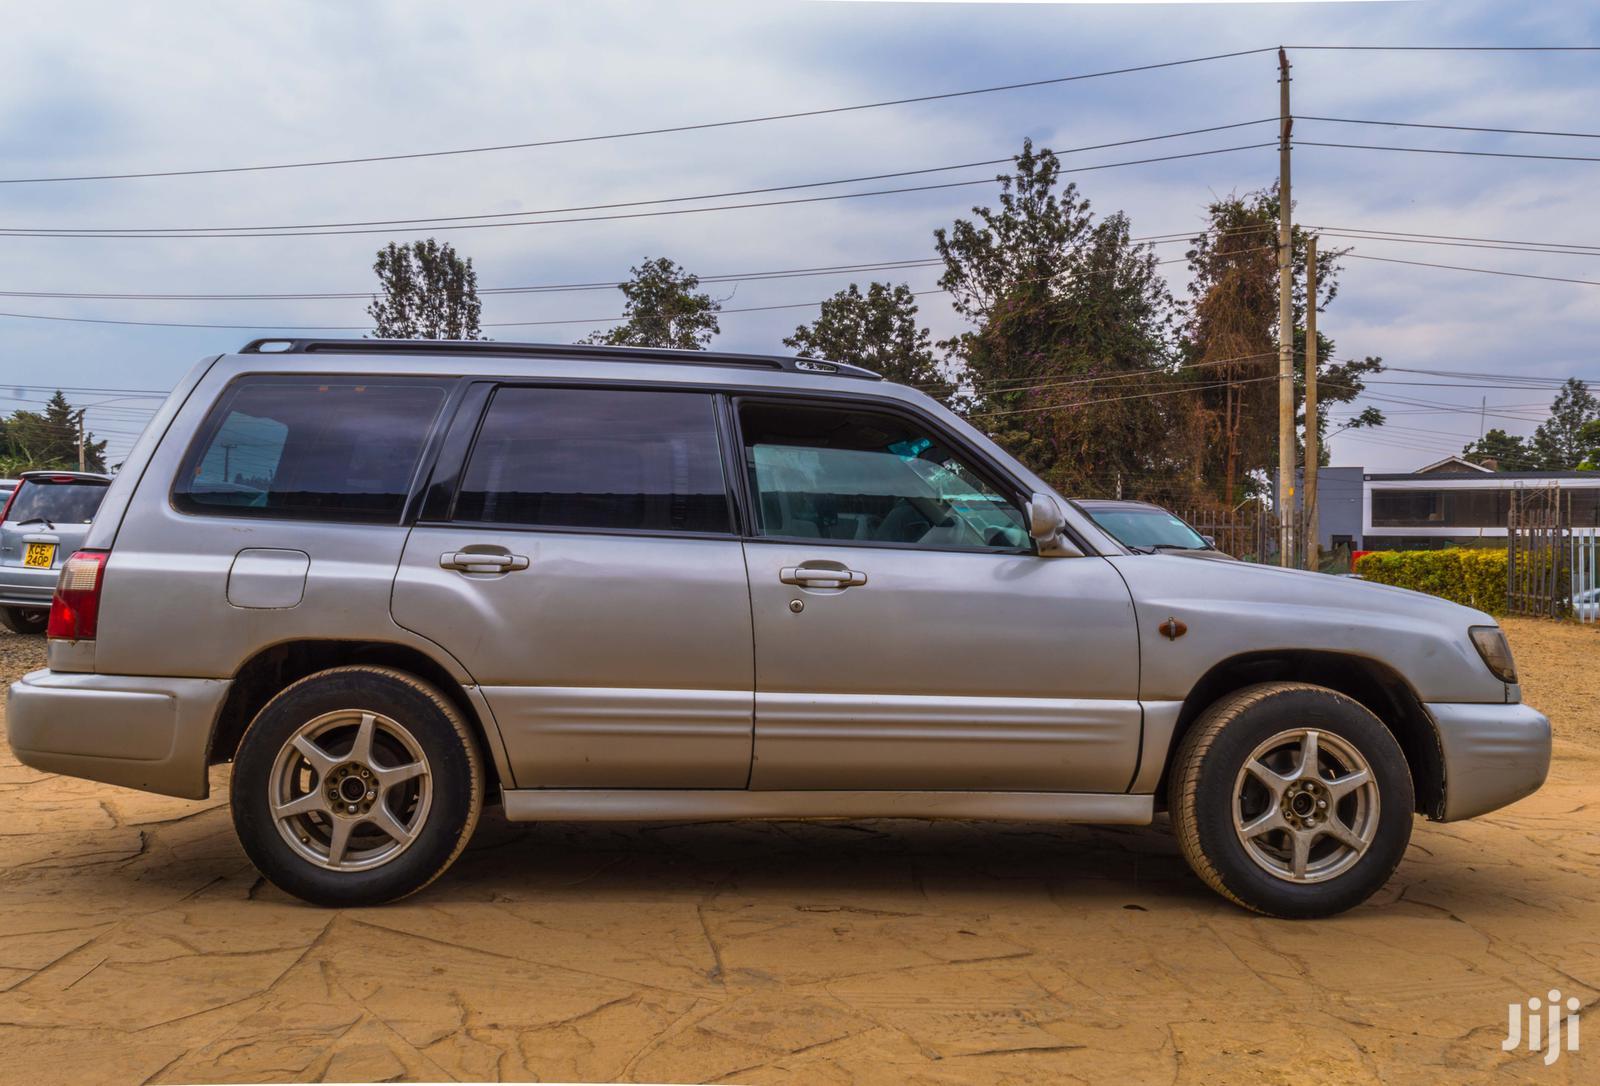 Subaru Impreza 2002 Gray | Cars for sale in Township E, Kiambu, Kenya